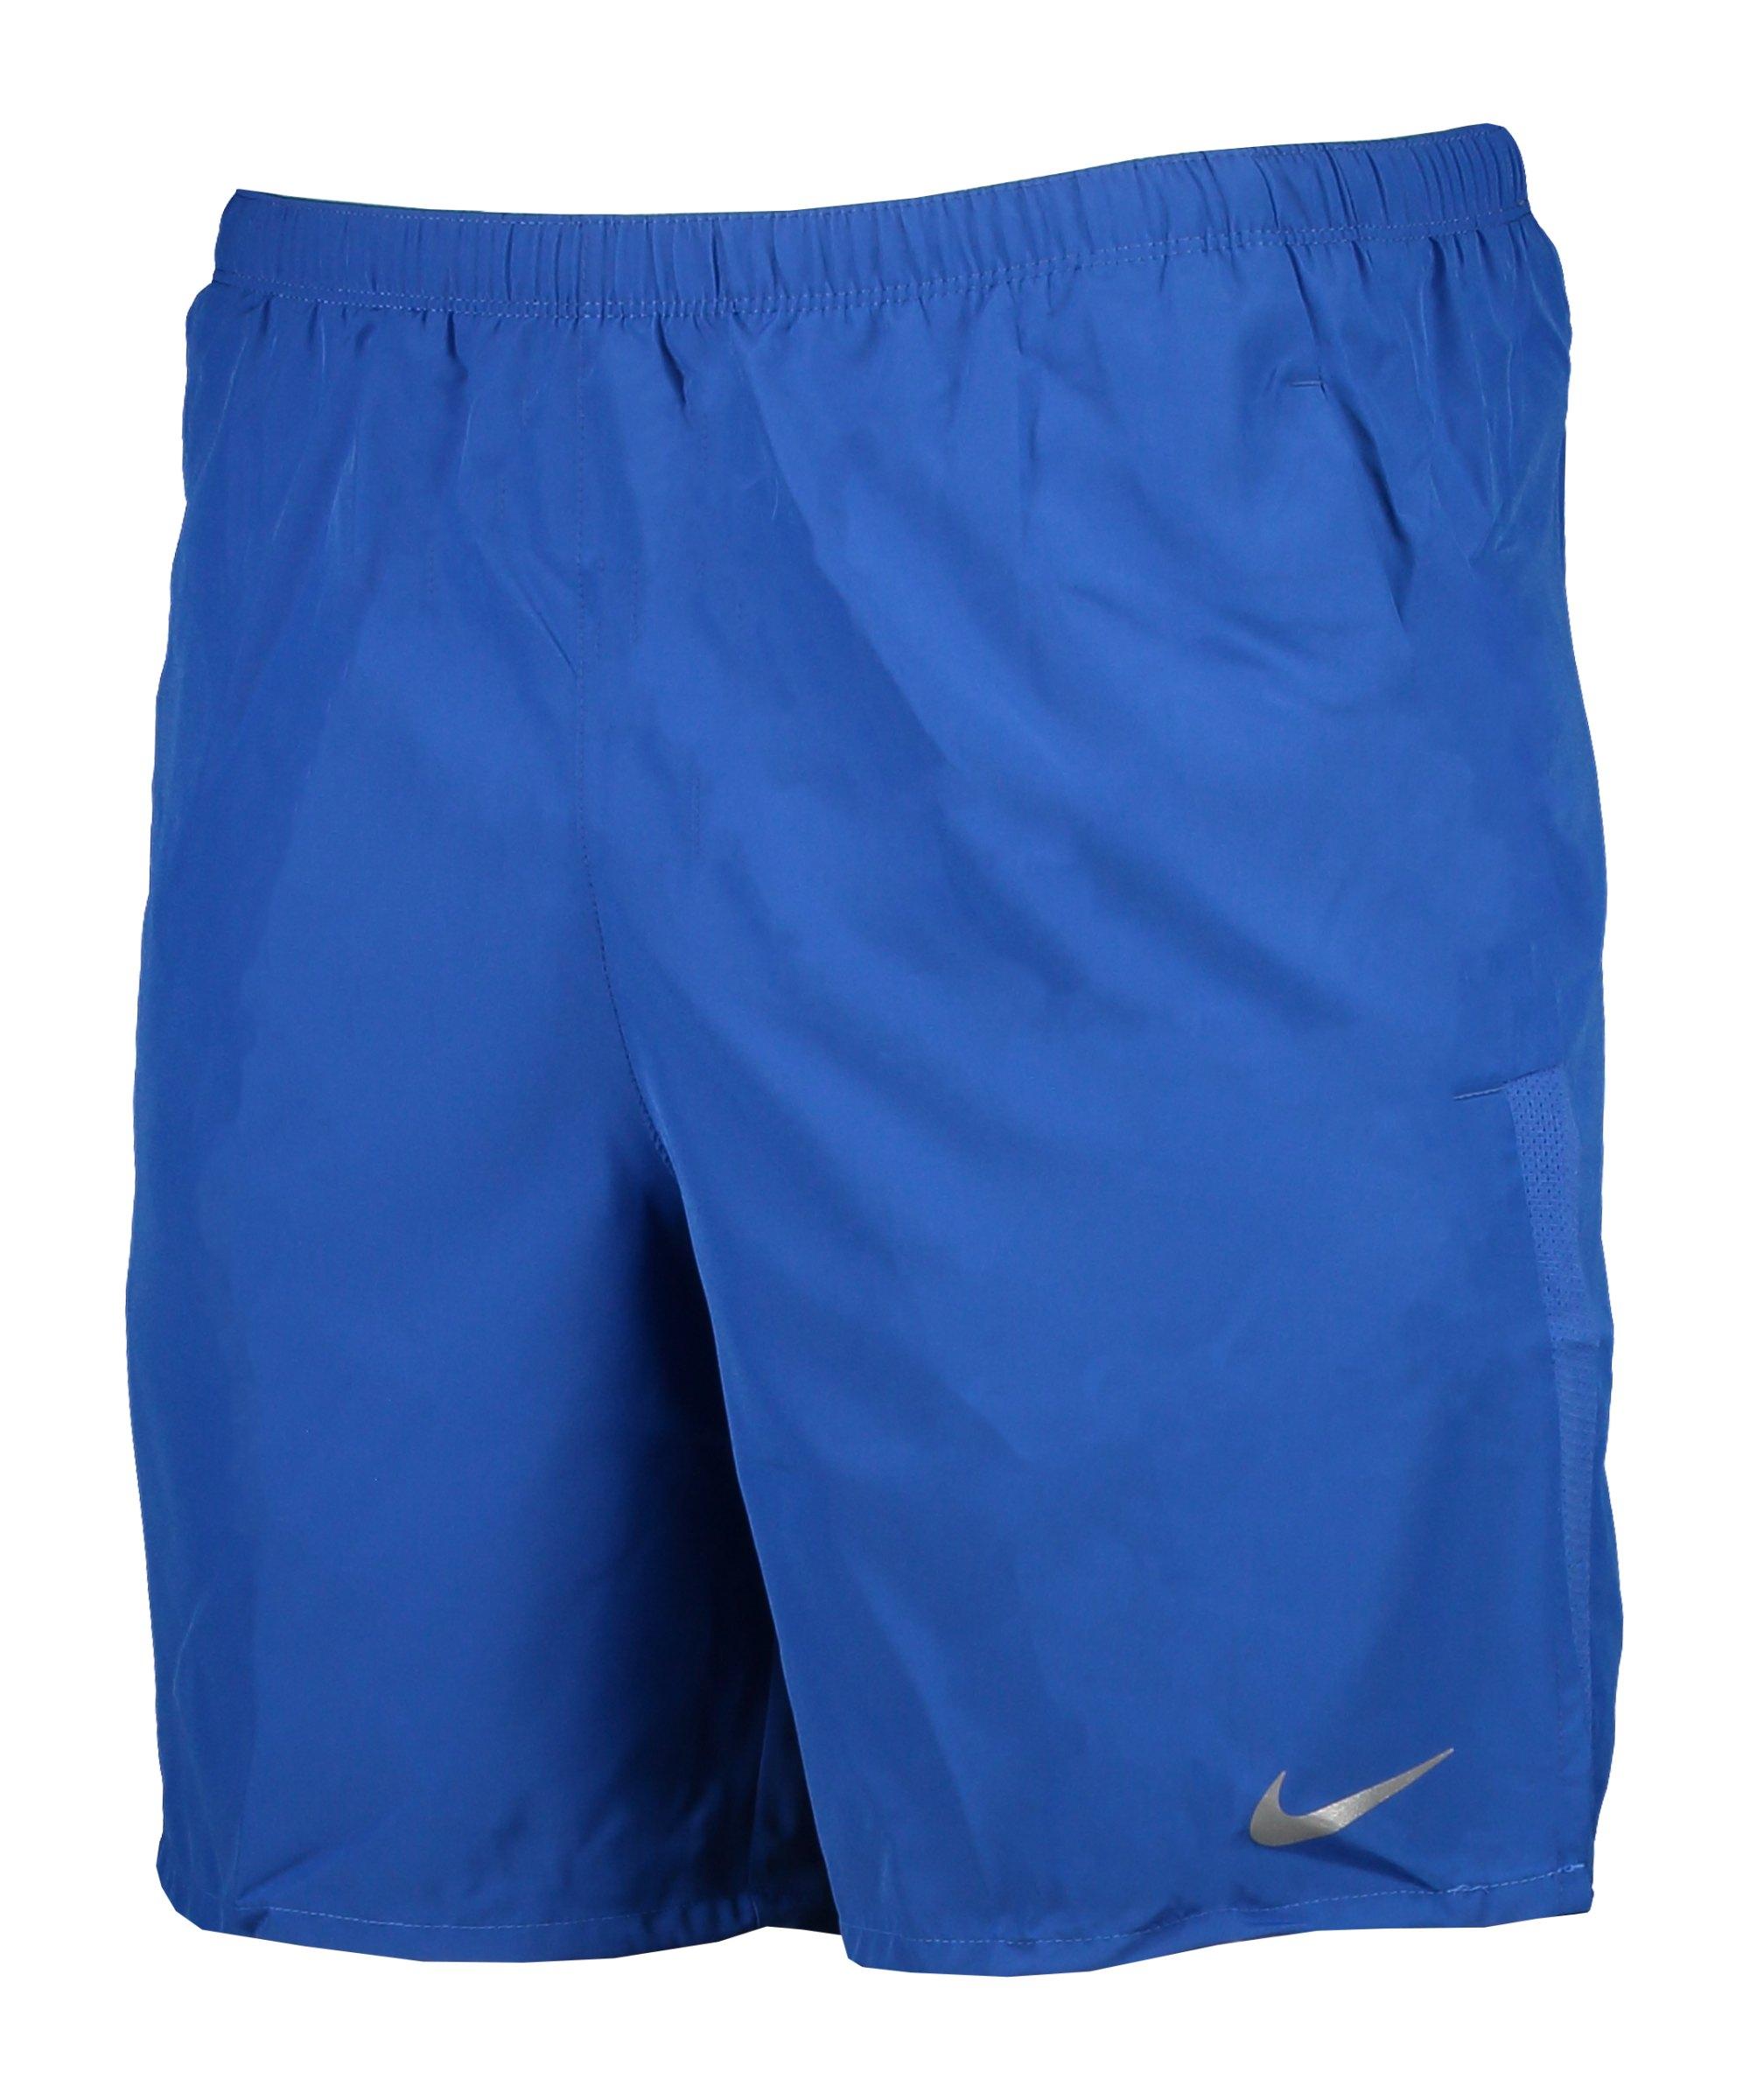 Nike Challenger Brief-Lined2 Short Running F480 - blau